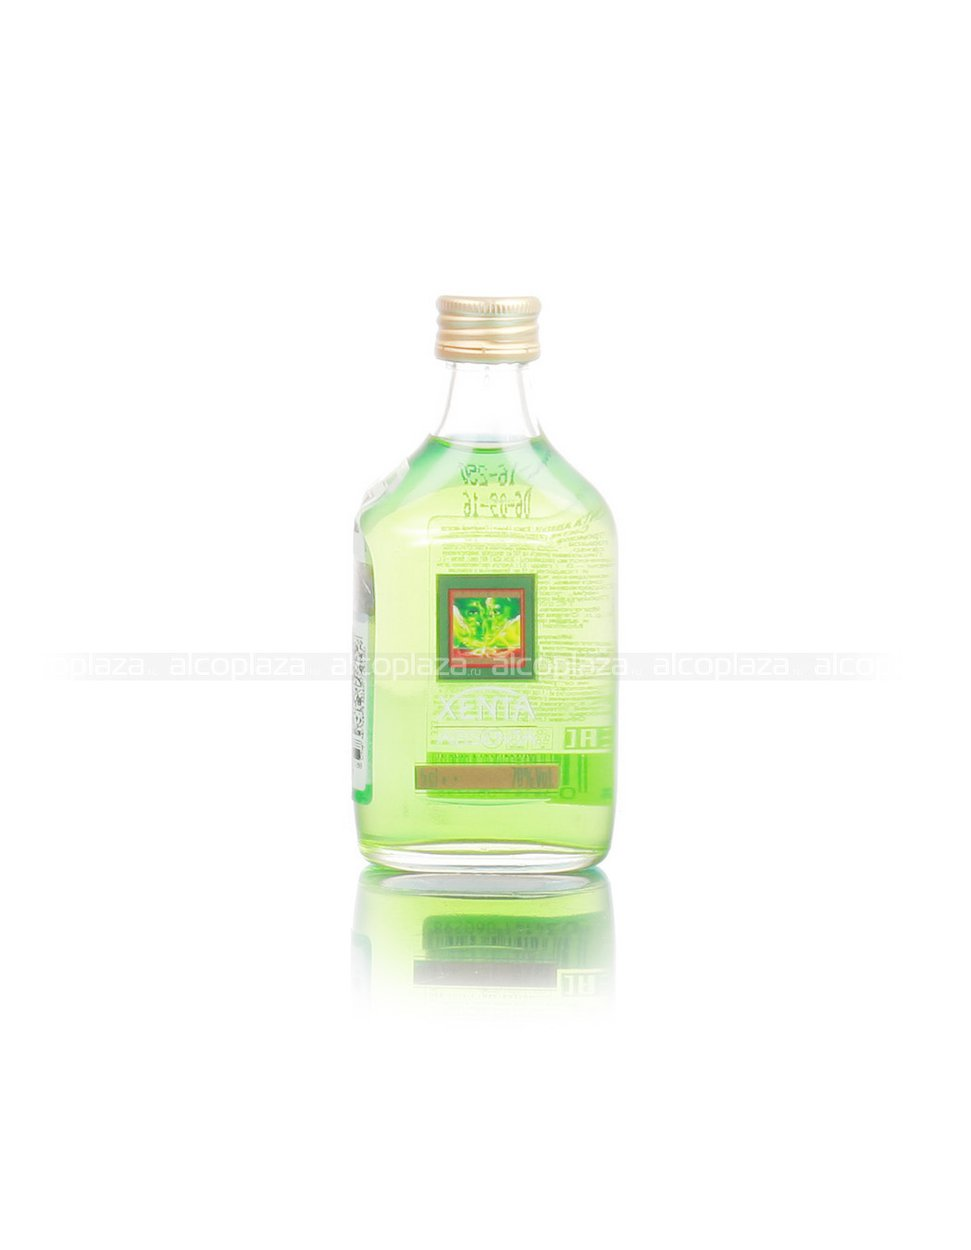 Xenta 50 ml абсент Ксента 0.05 л.